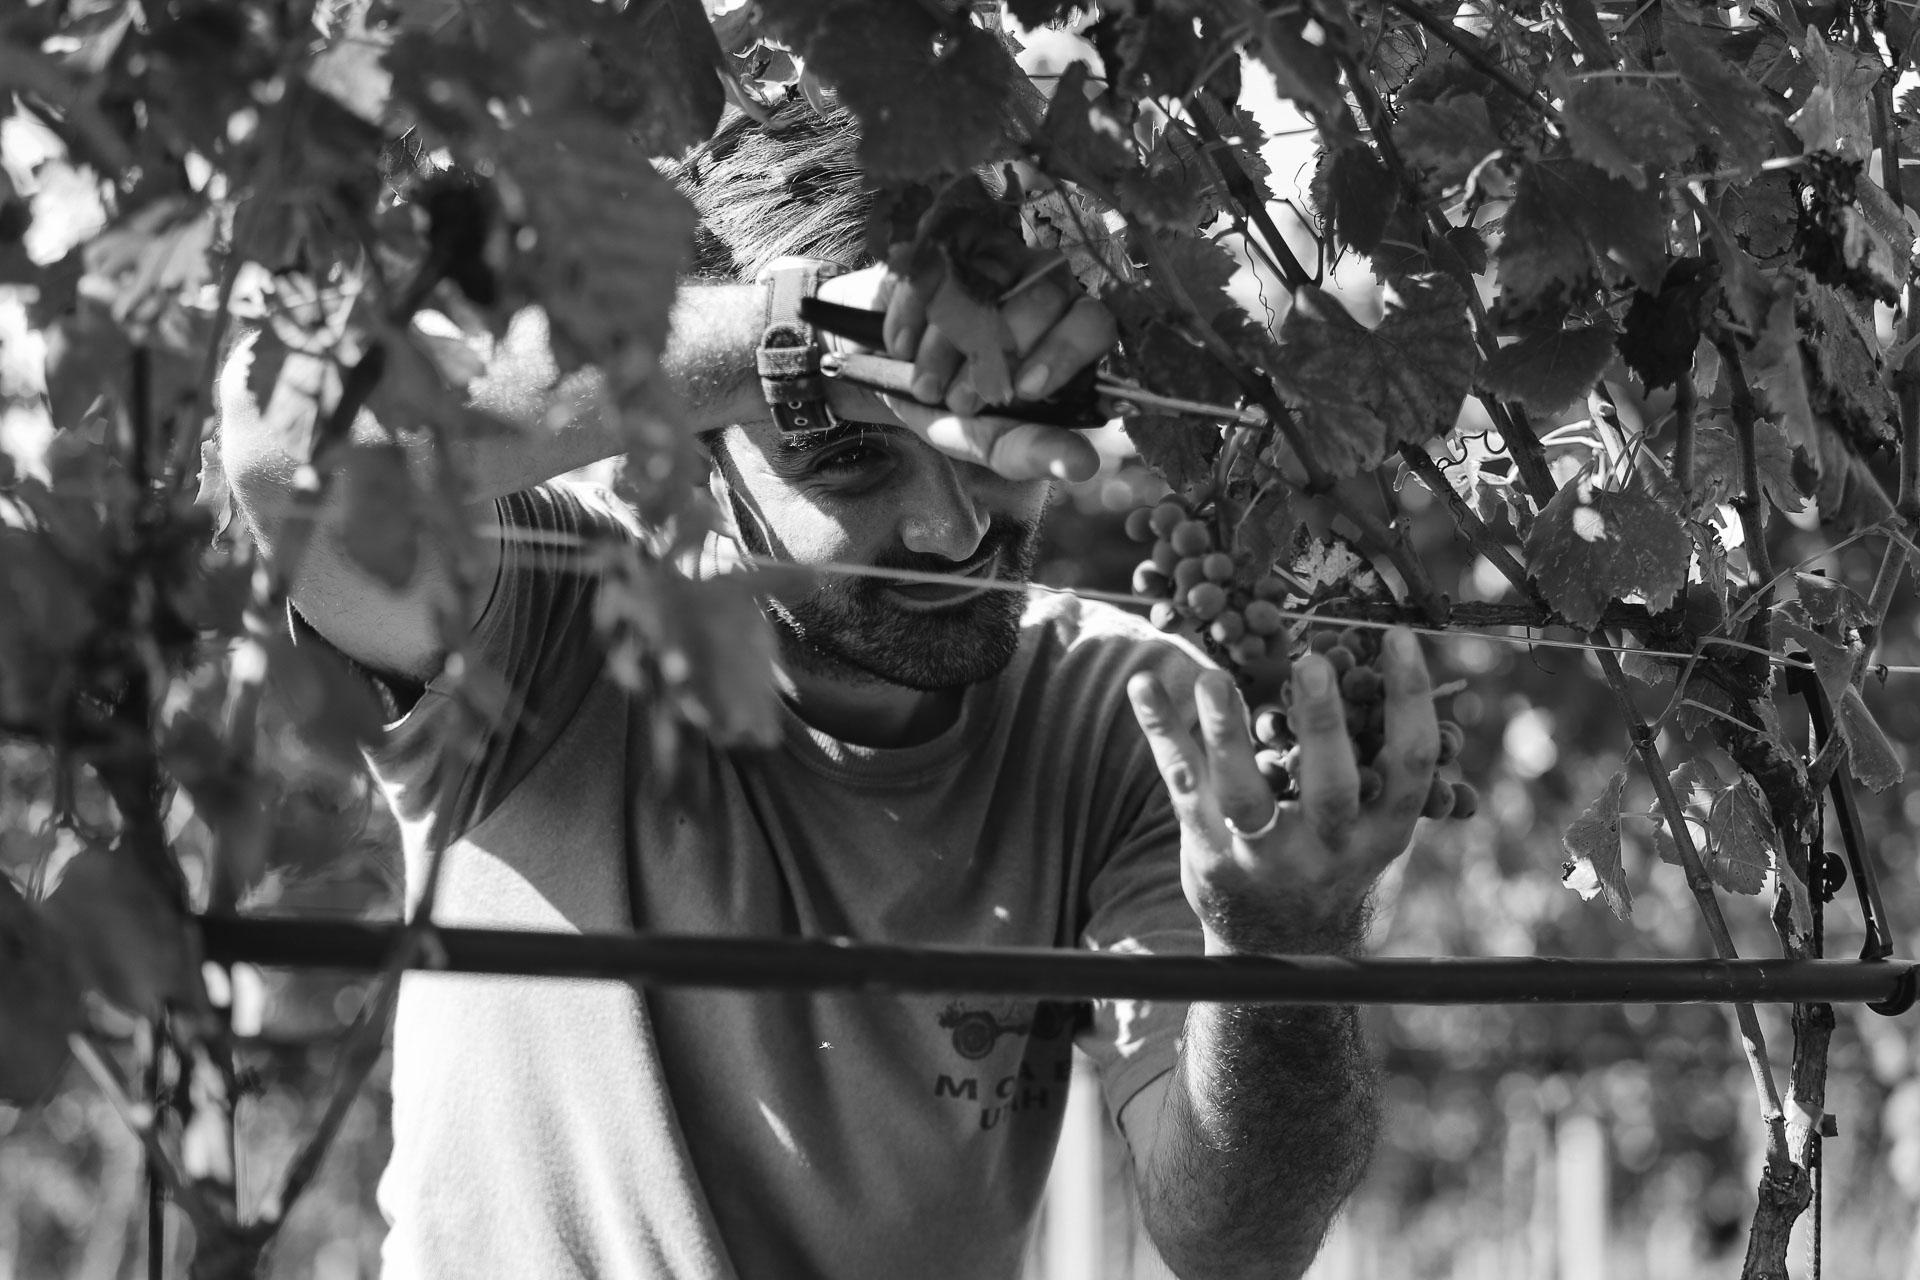 010-Sauro-maule-wineyards-organic-harvest-2016-_RUI7292_p_Lr_web_HD